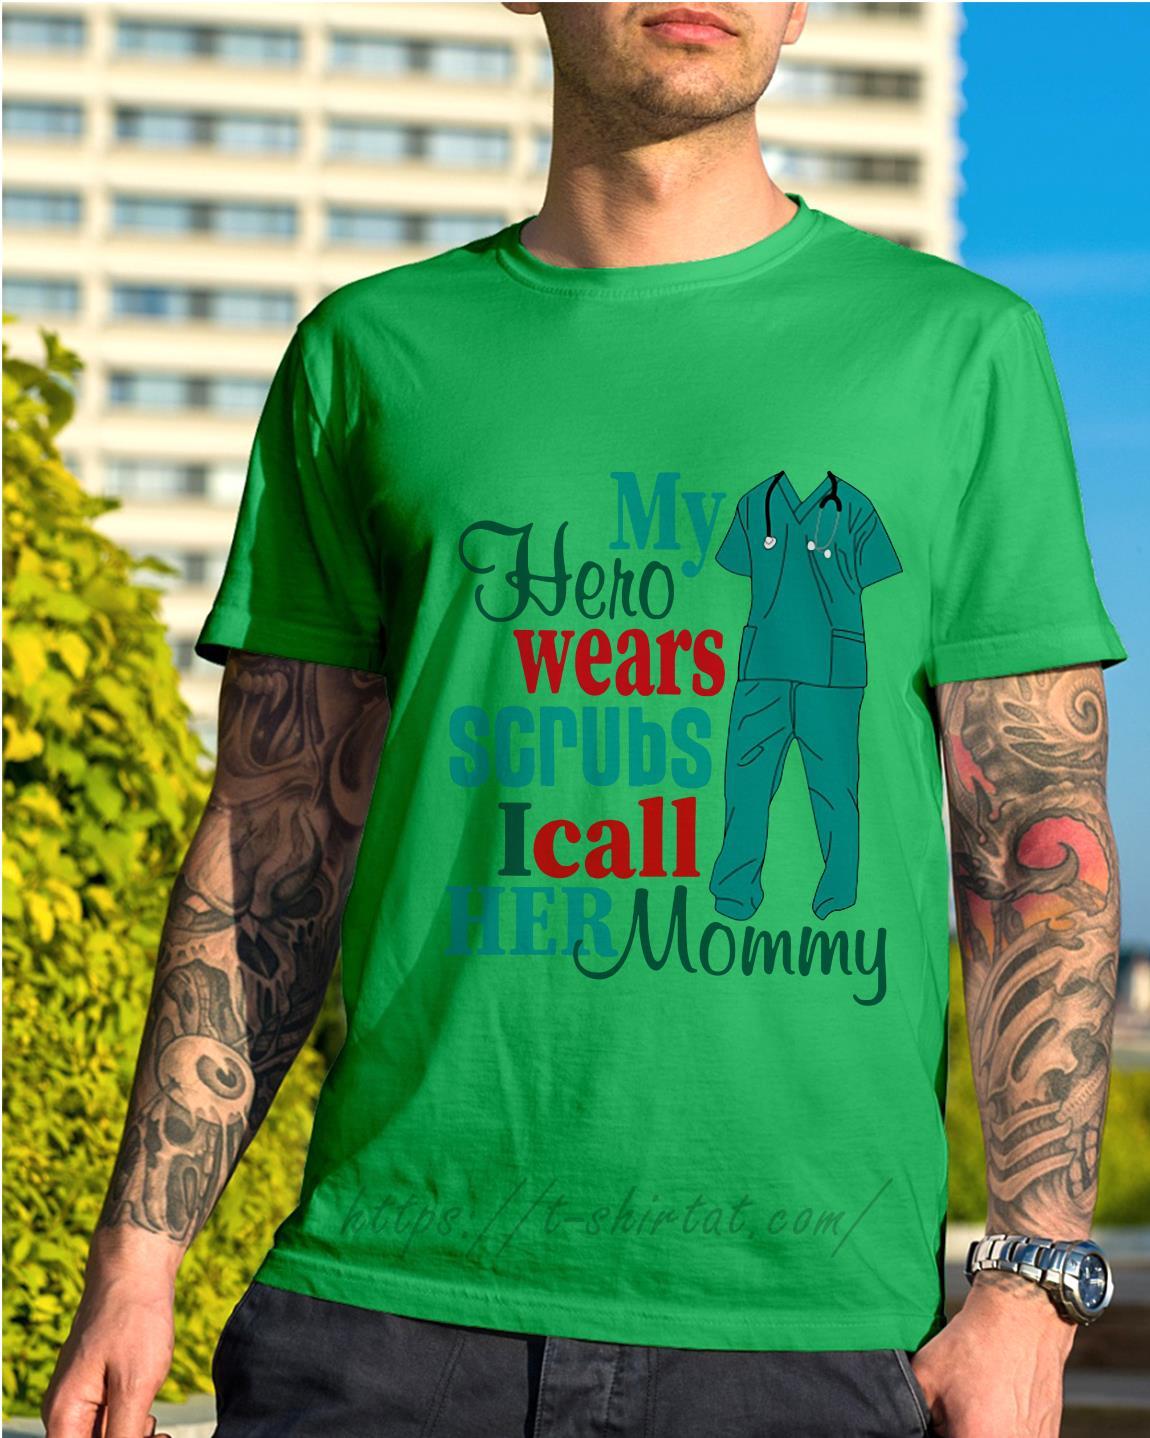 199308580 Nurse my hero wears scrubs I call her mommy shirt